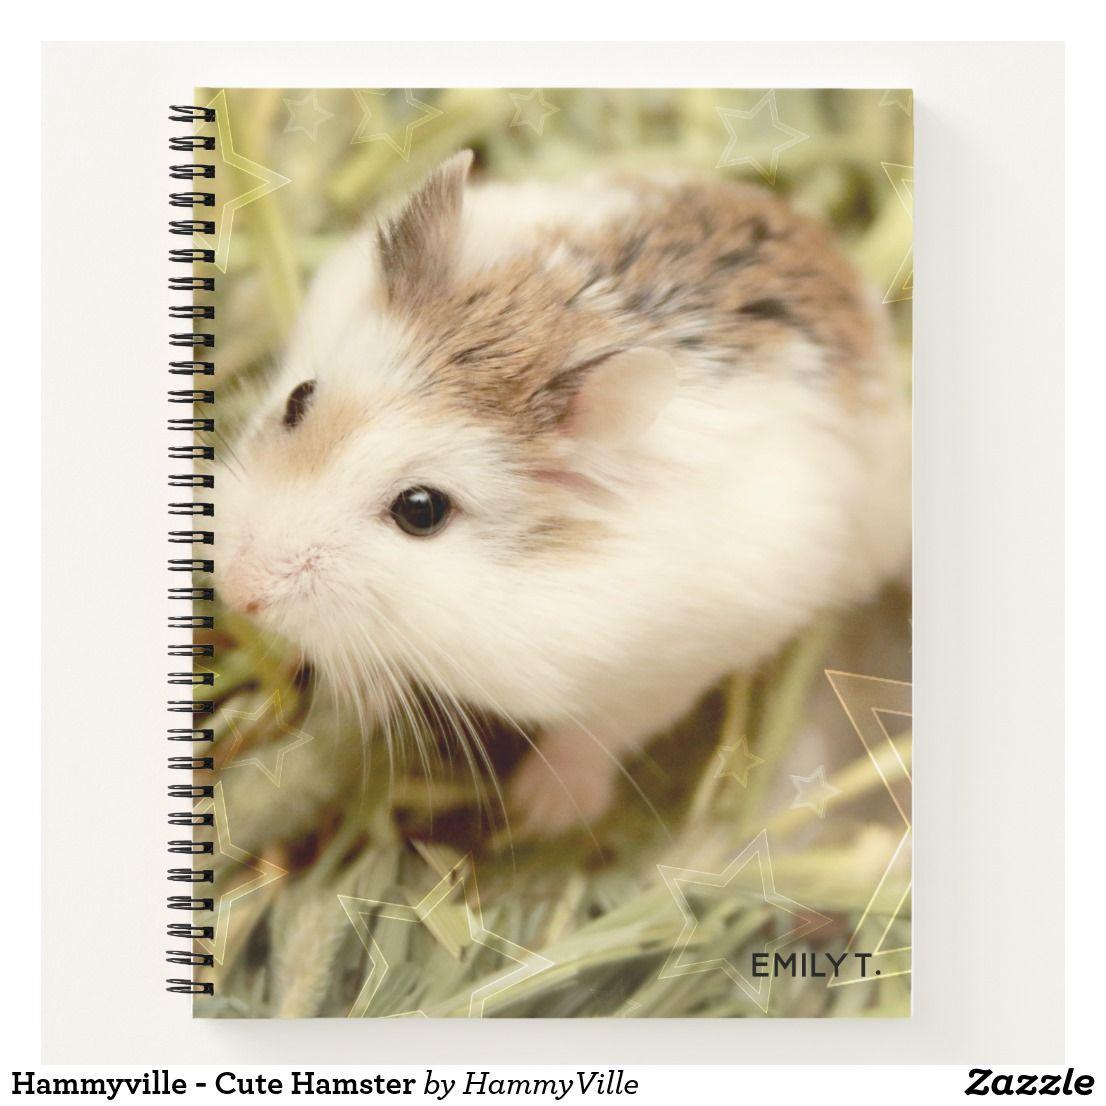 Hammyville Cute Hamster Notebook Hammyville Hamster Personalized Personalizedgifts Cuteanimals Shopping Gifts Hamster Baby Hamster Notebook Features